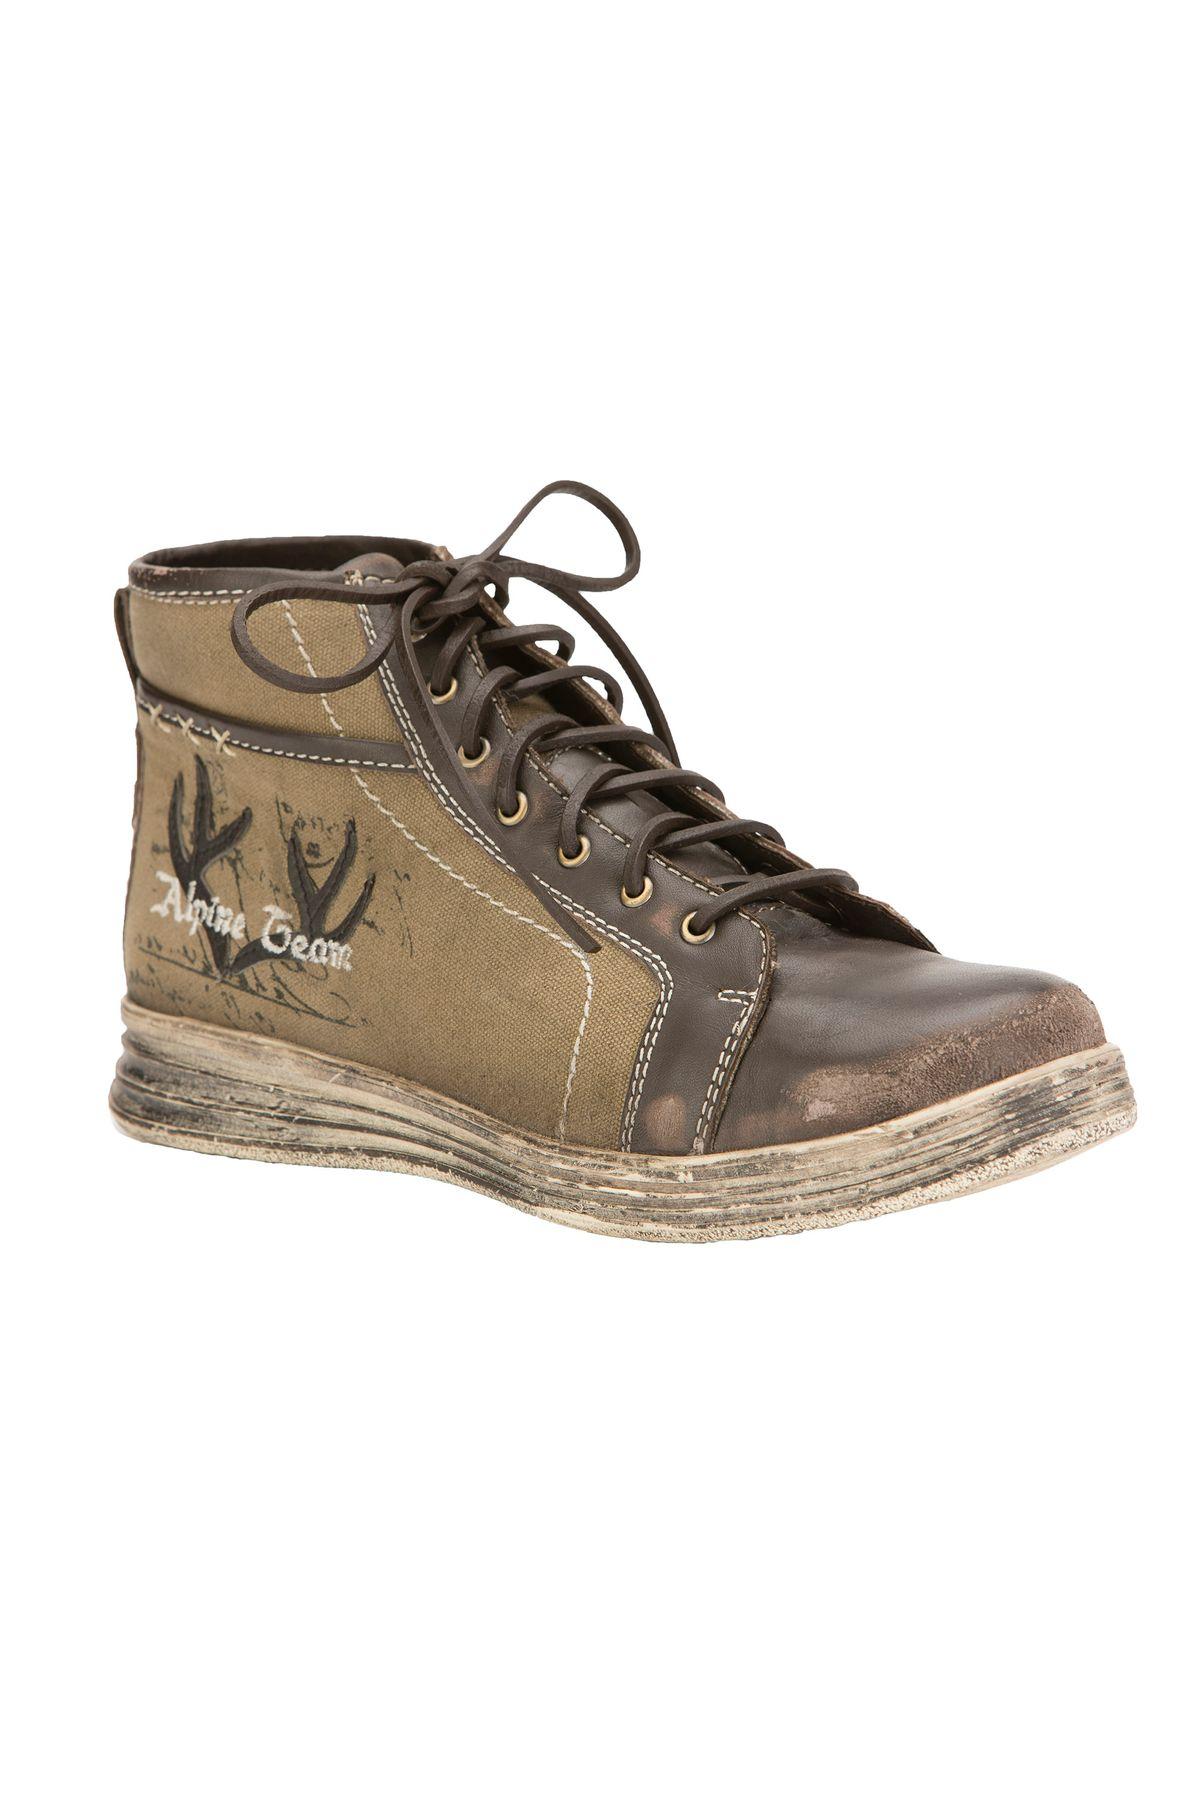 STOCKERPOINT - Herren Trachten Schuhe, 1295 – Bild 1